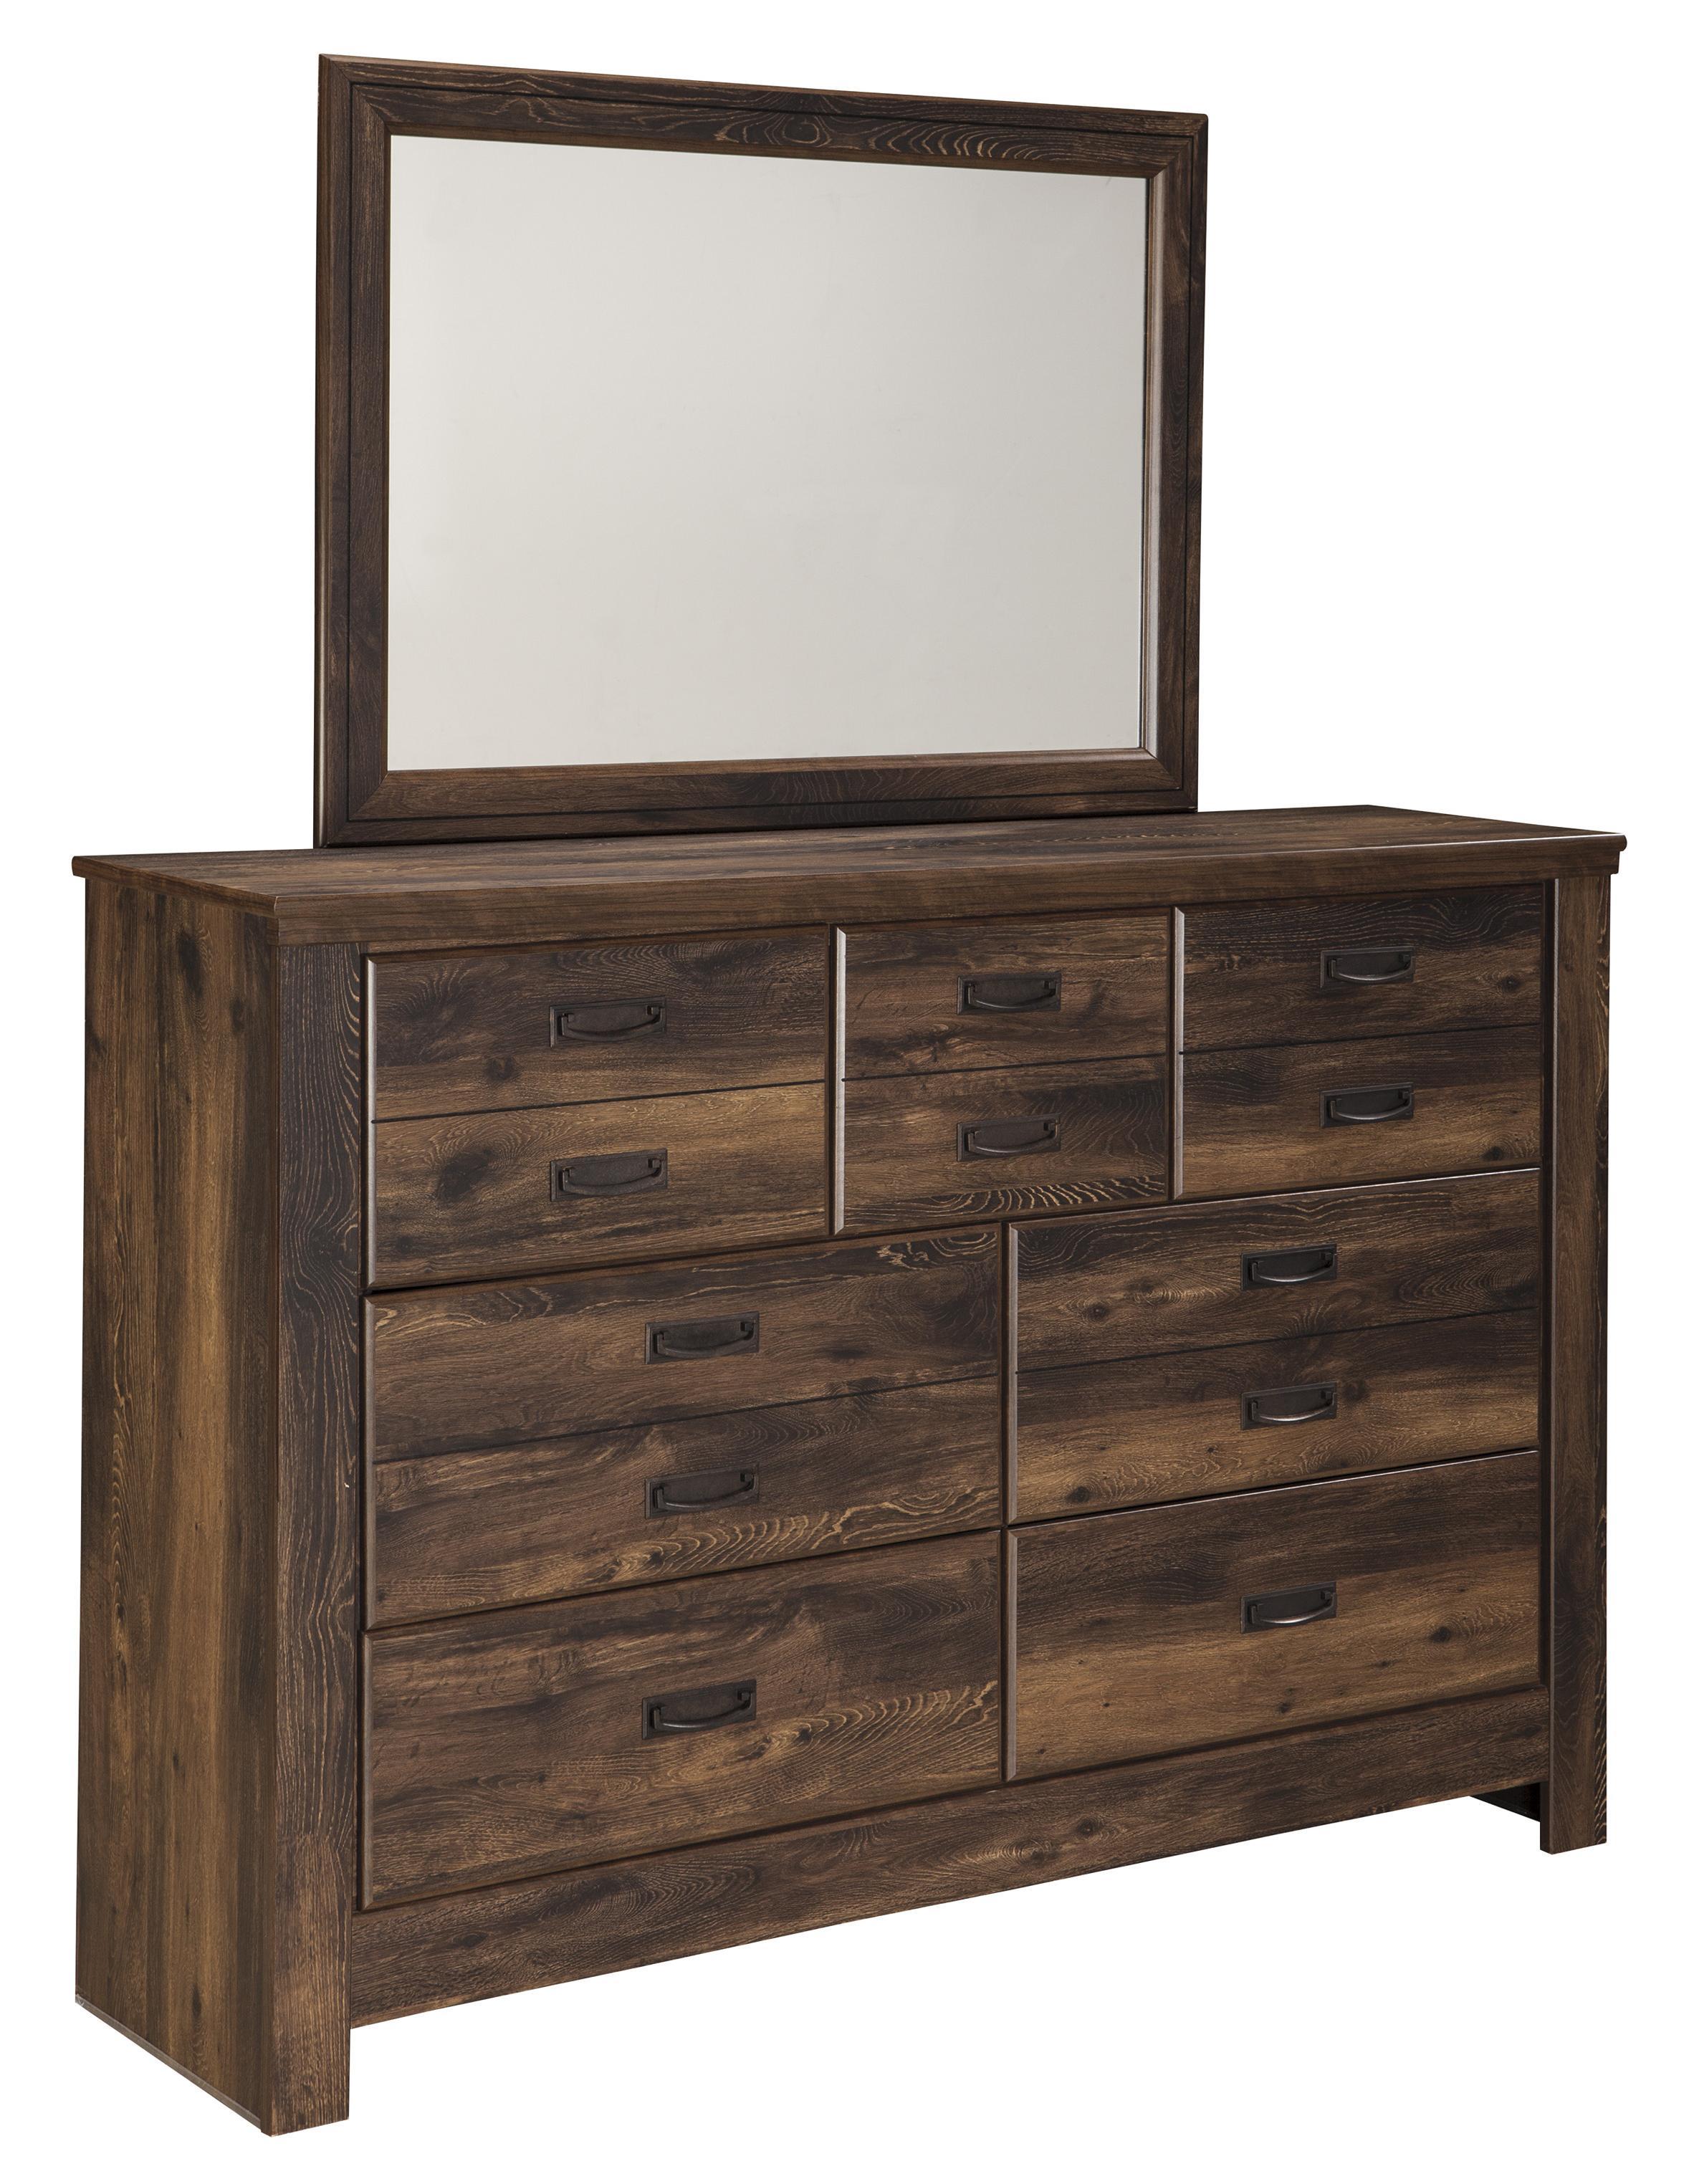 AUGUSTUS Dresser & Mirror by StyleLine at EFO Furniture Outlet